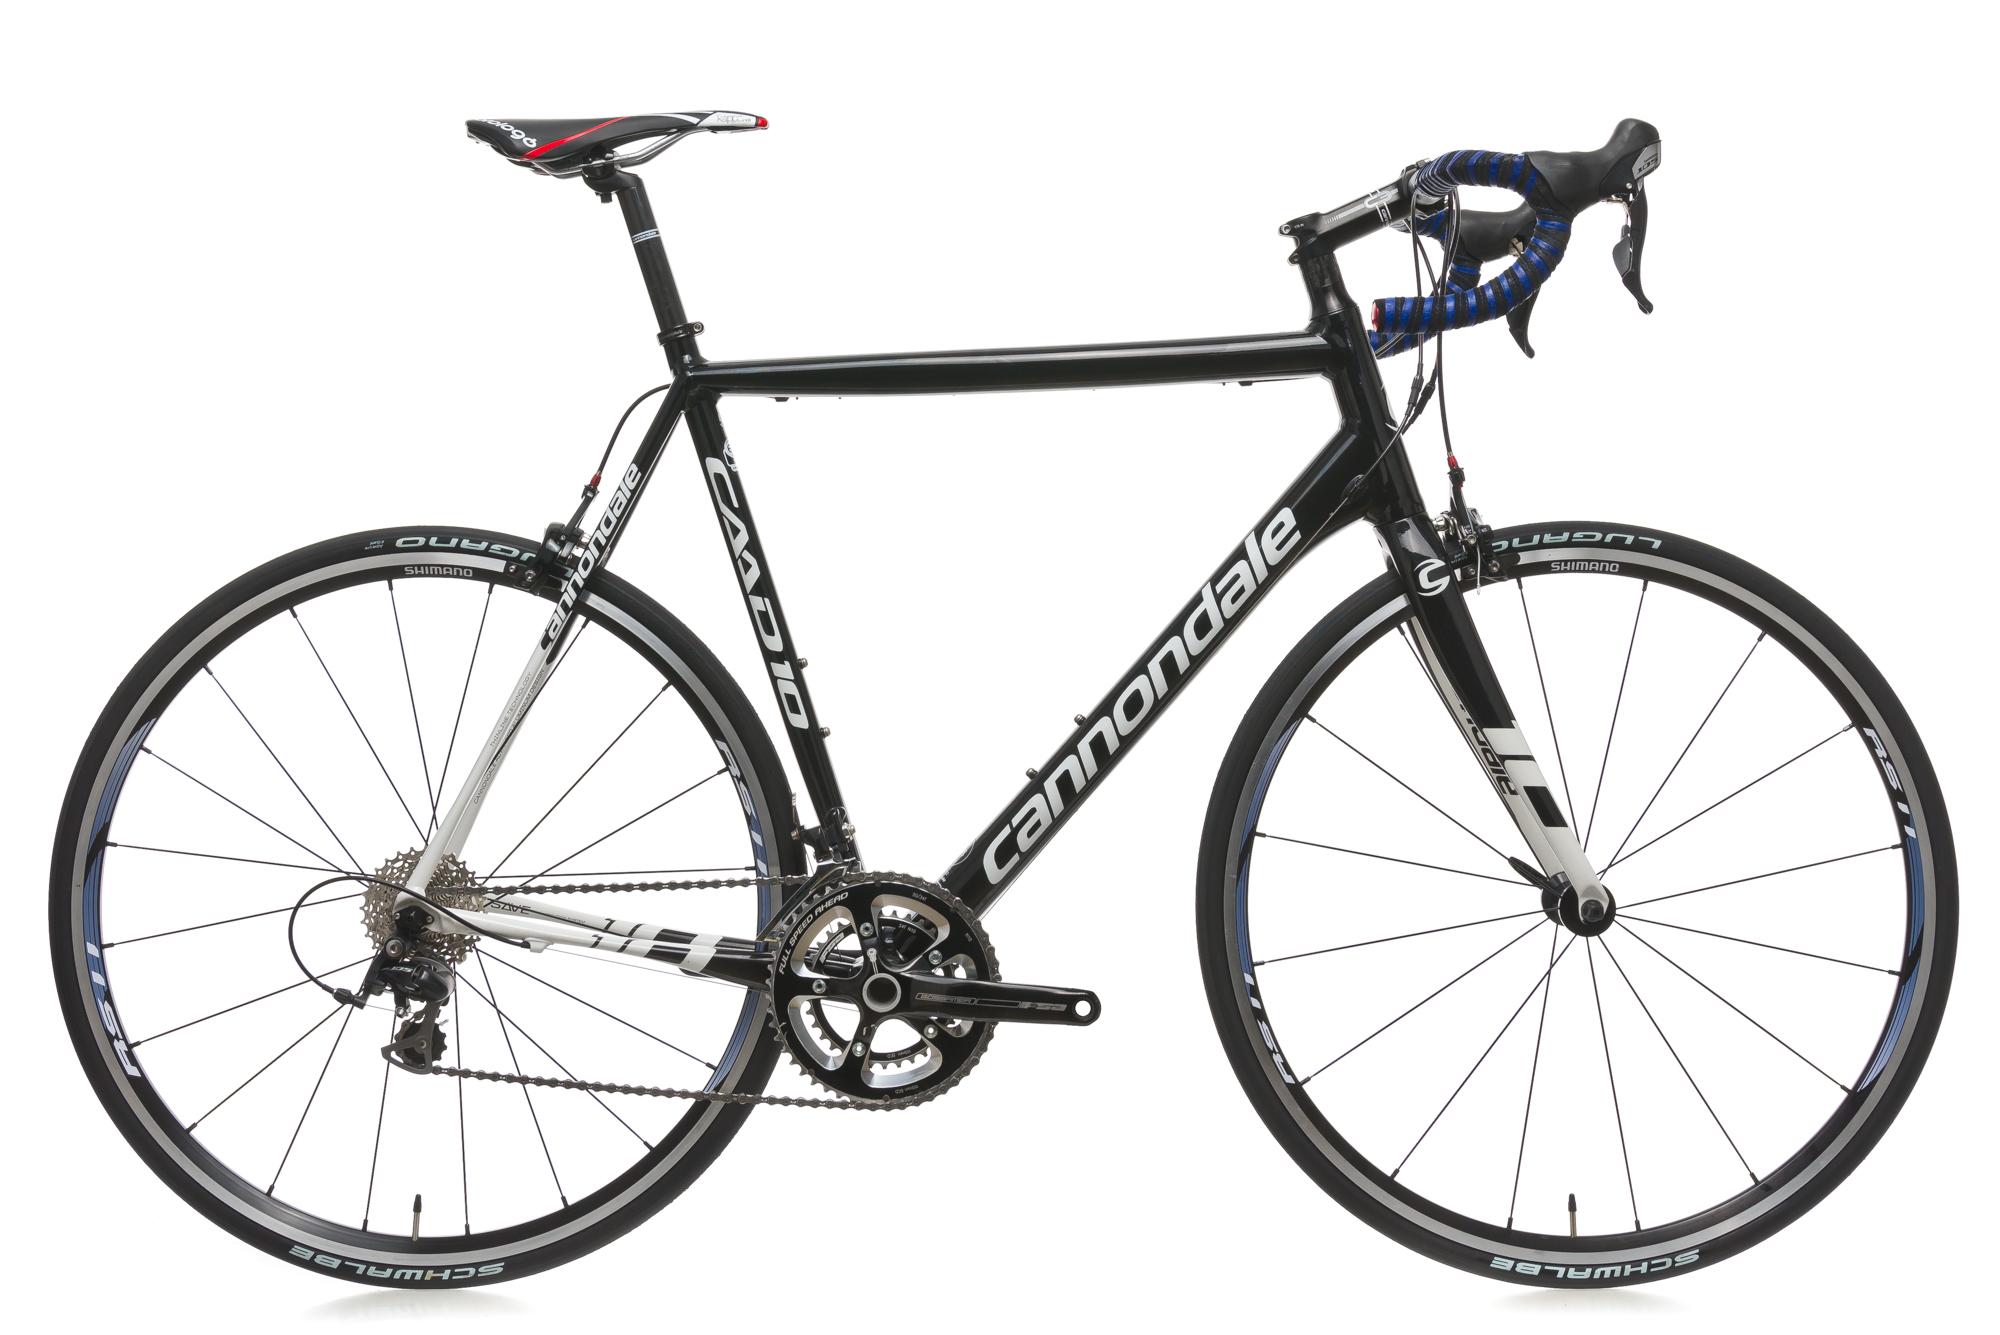 2011 Cannondale CAAD10 5 Road Bike 60cm XL Aluminum Shimano 105 | eBay